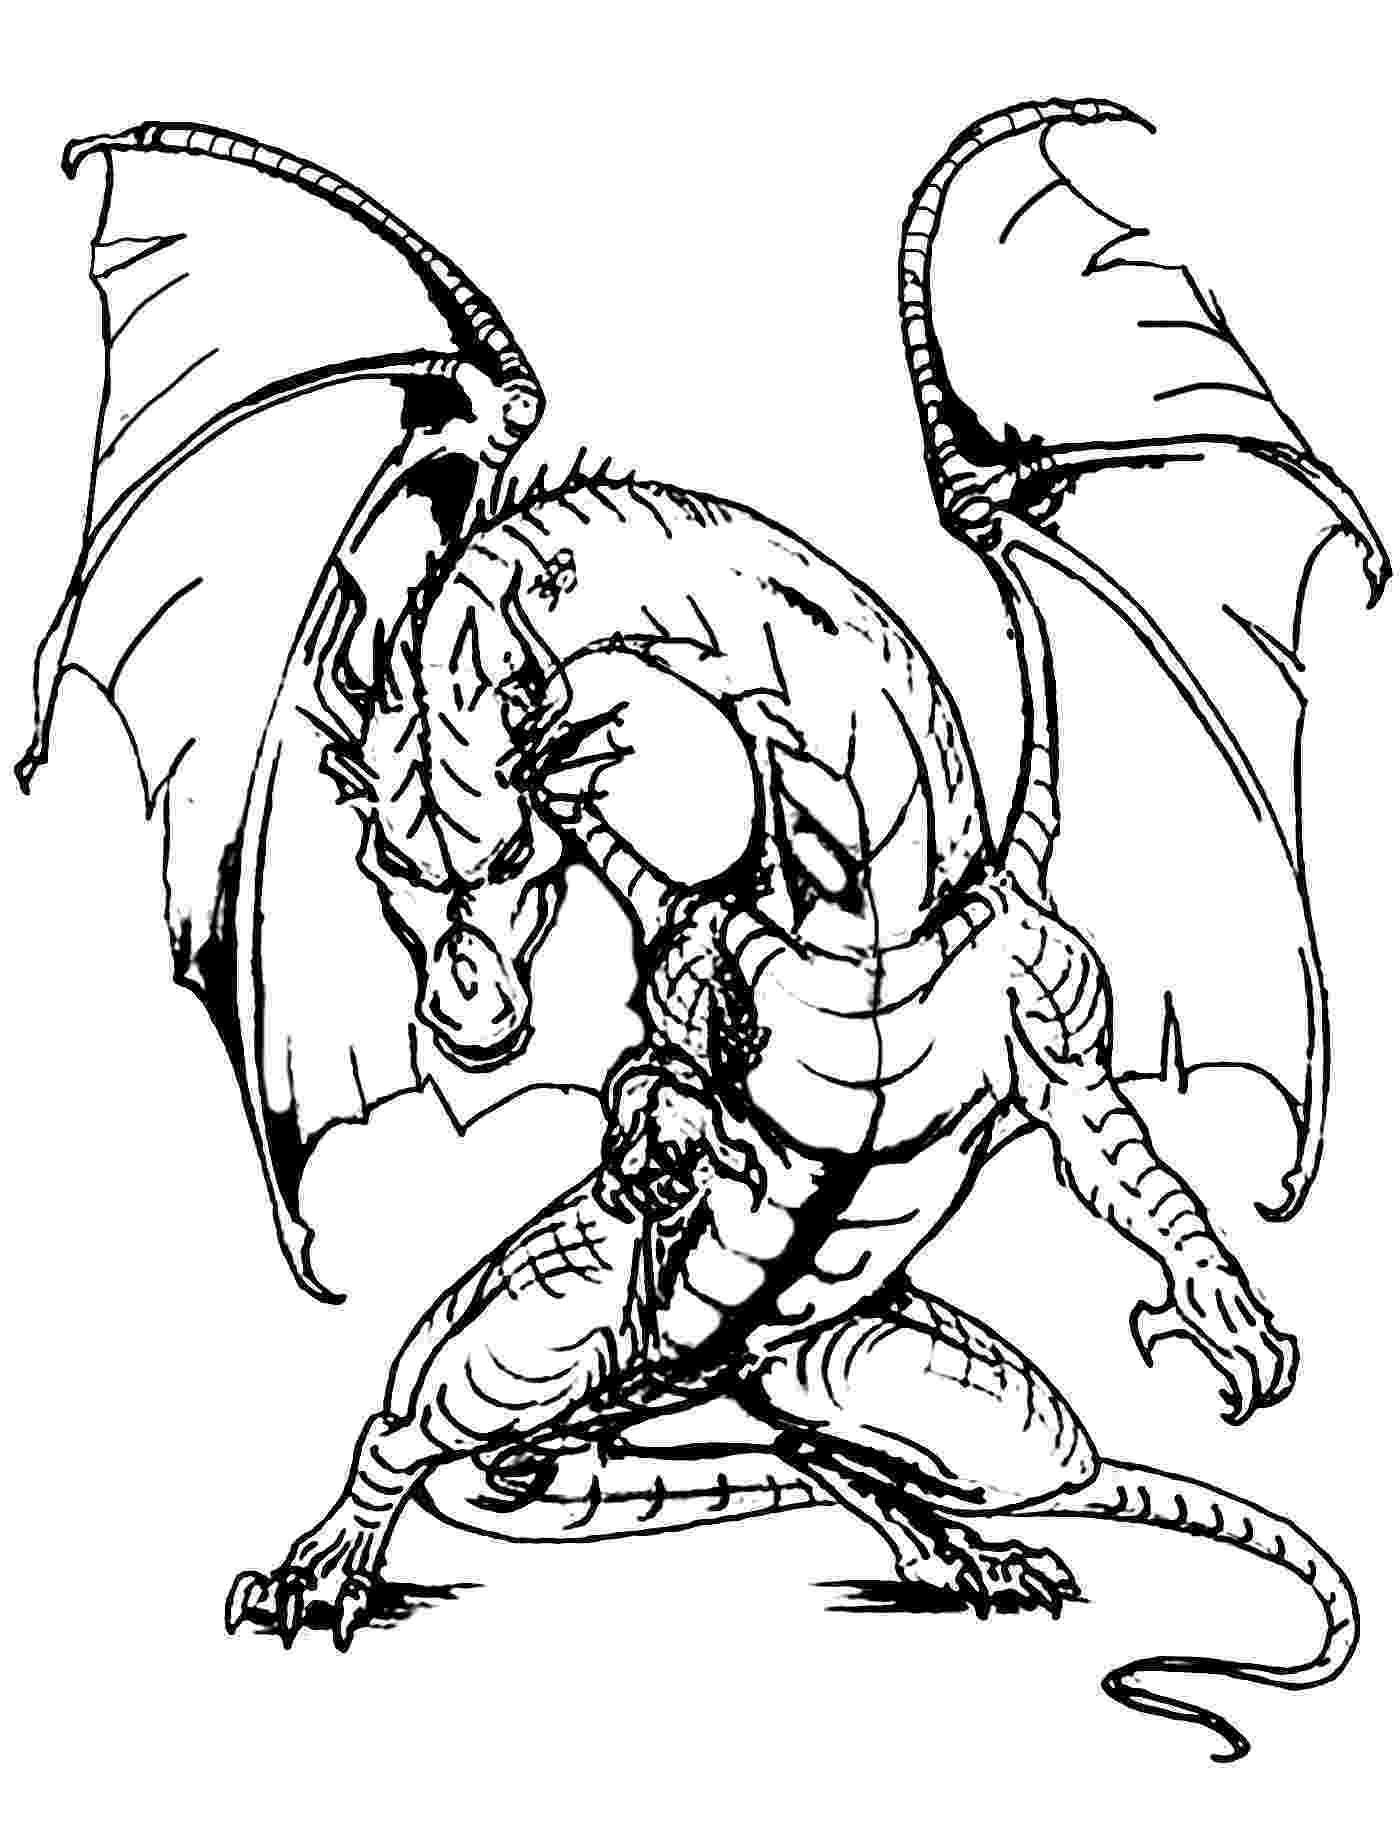 dragon coloring pages dragon coloring pages printable dragon coloring pages